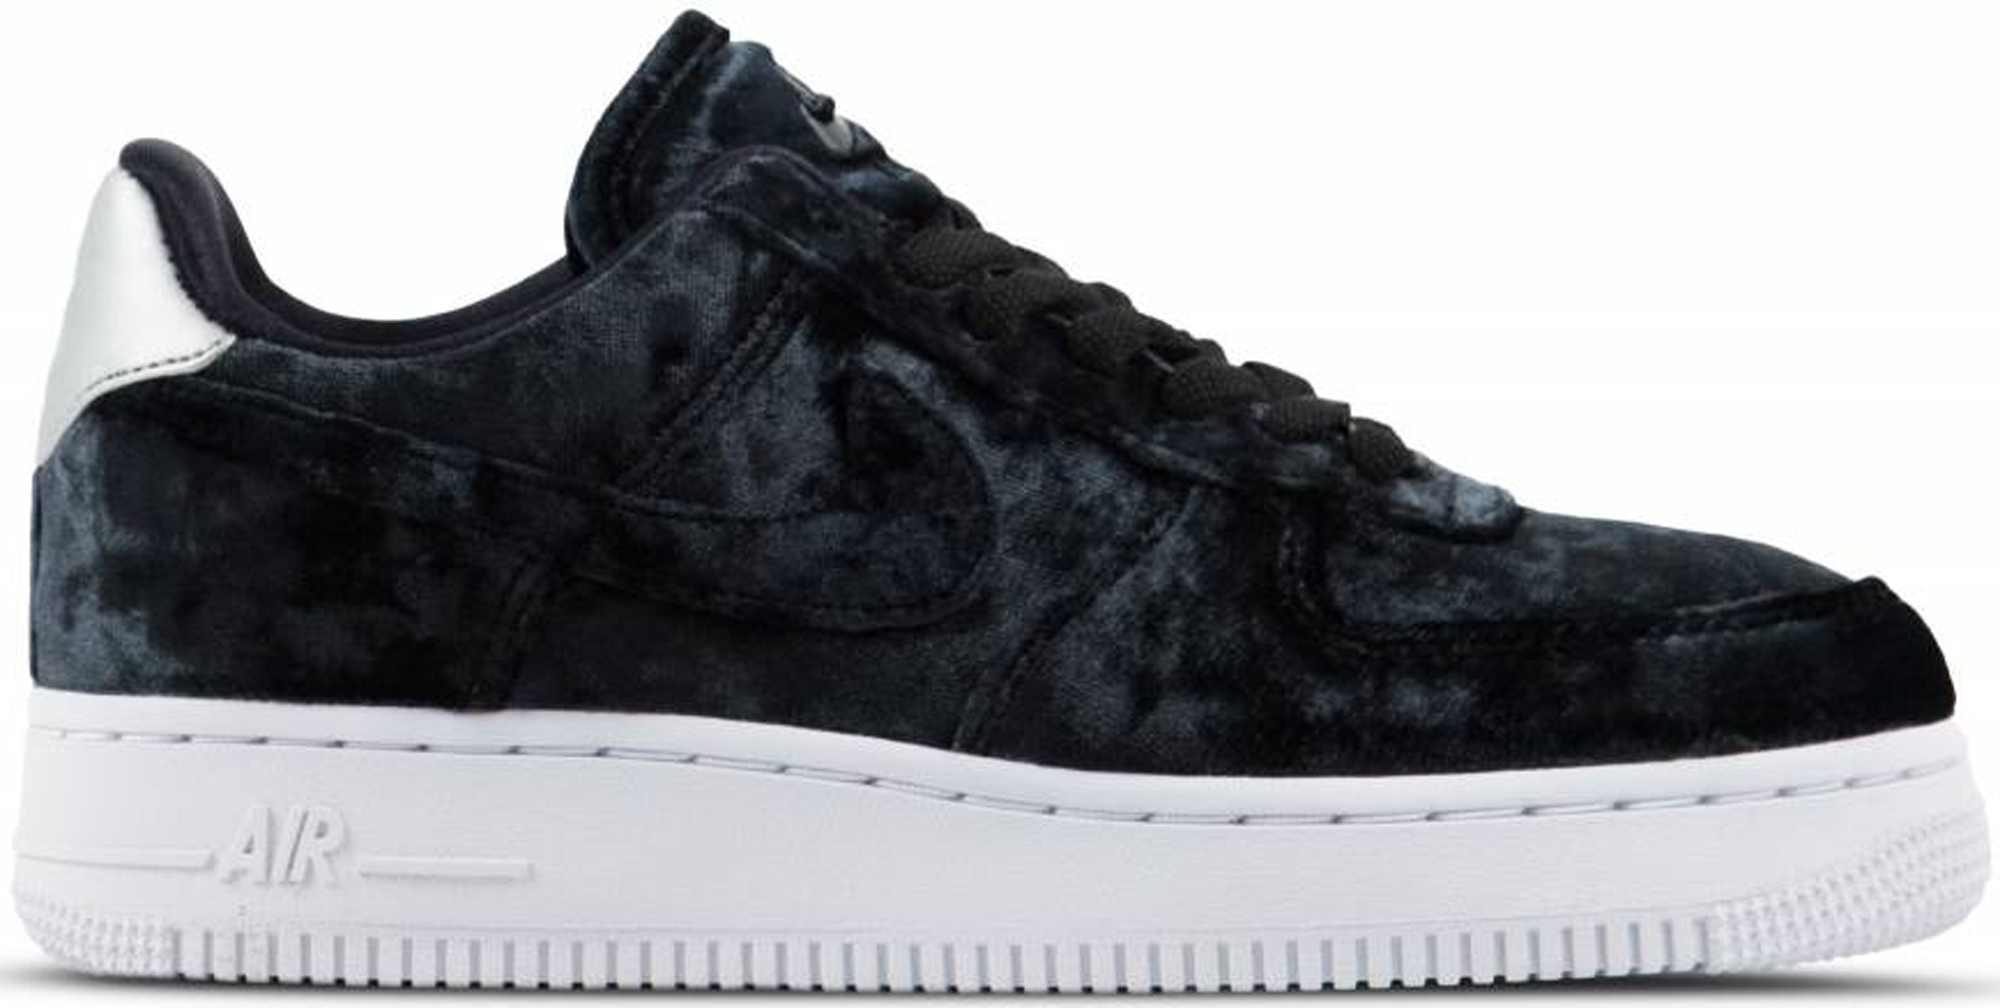 Nike Air Force 1 Low Black Velvet (W